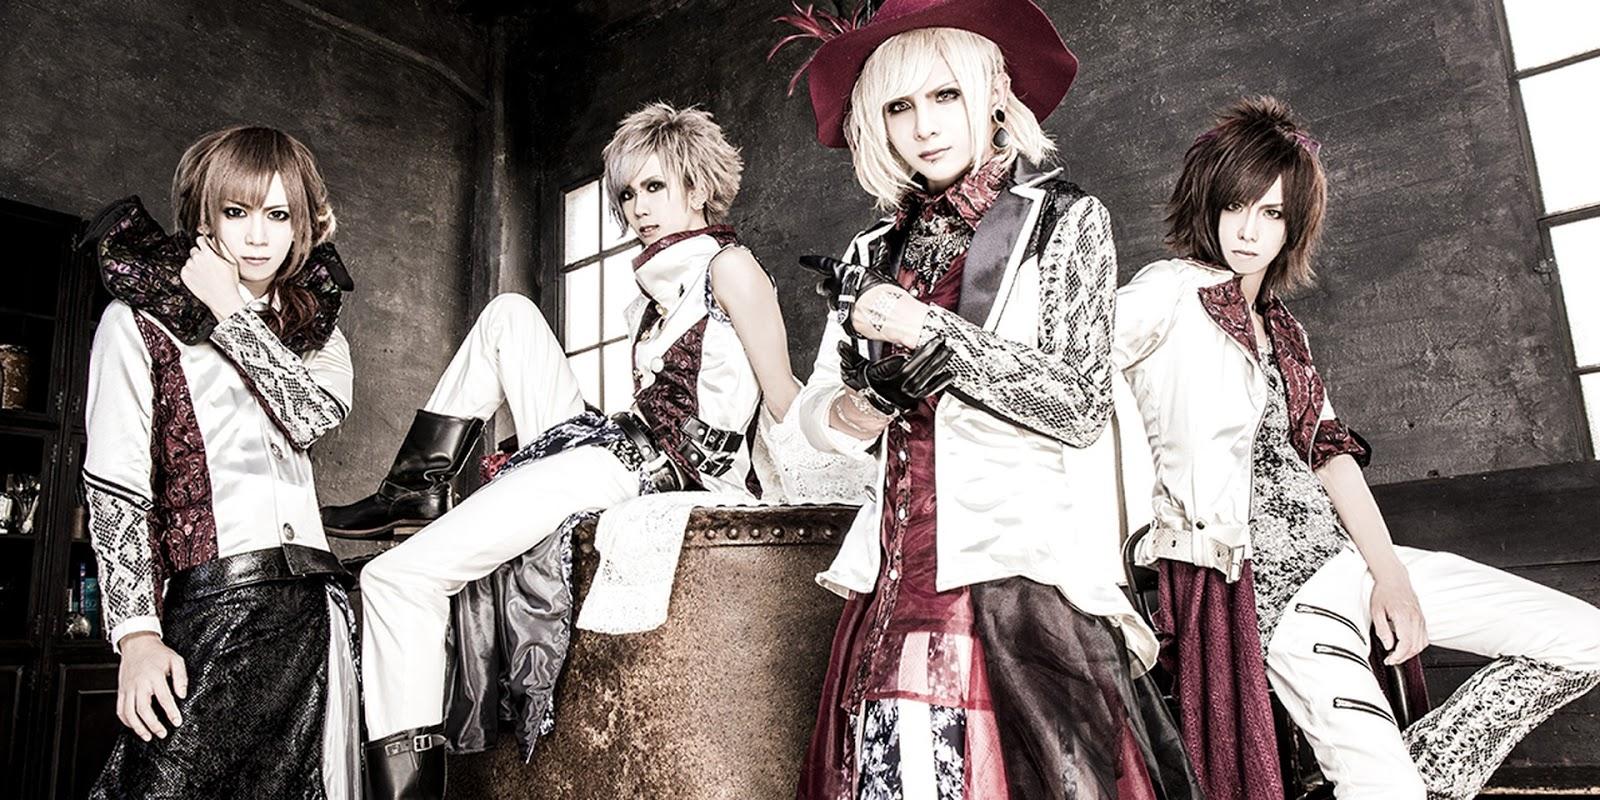 banda antithesis Origin antithesis mediafire nihon ongaku   vk 19 sep 2017 mp3 \ 320 3:57 banda de metal alternativo fundada a principios del.